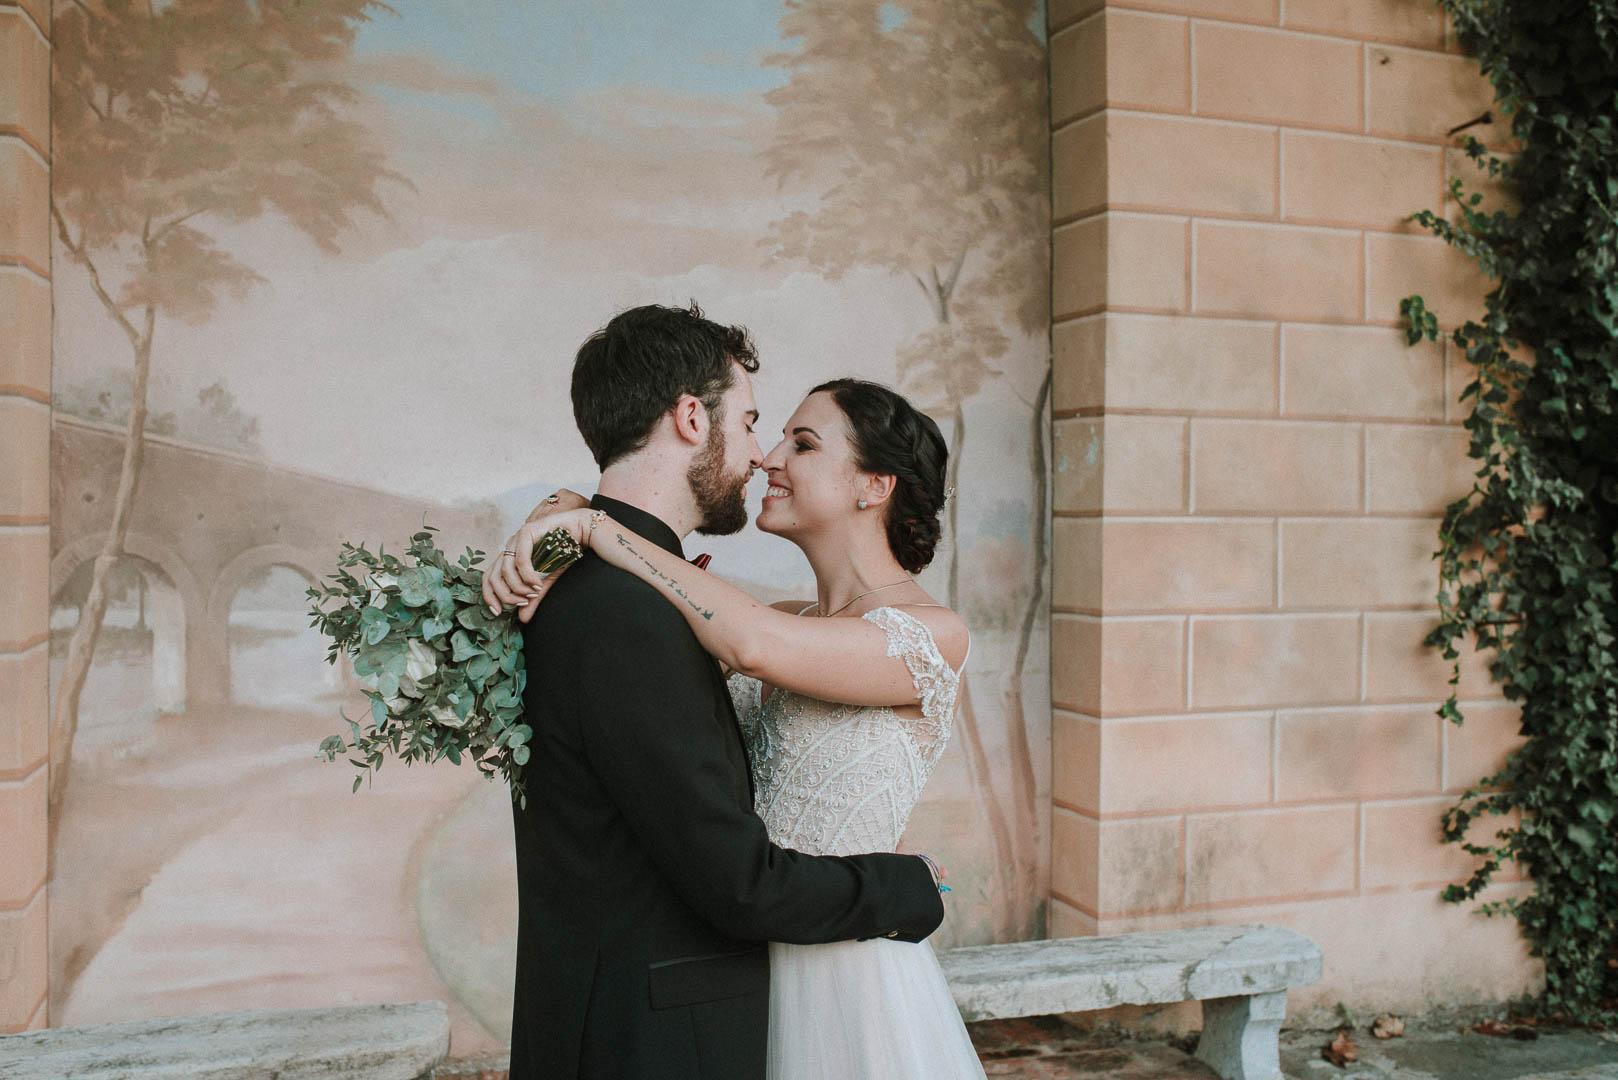 wedding-photographer-destination-fineart-bespoke-reportage-tuscany-villascorzi-vivianeizzo-spazio46-97